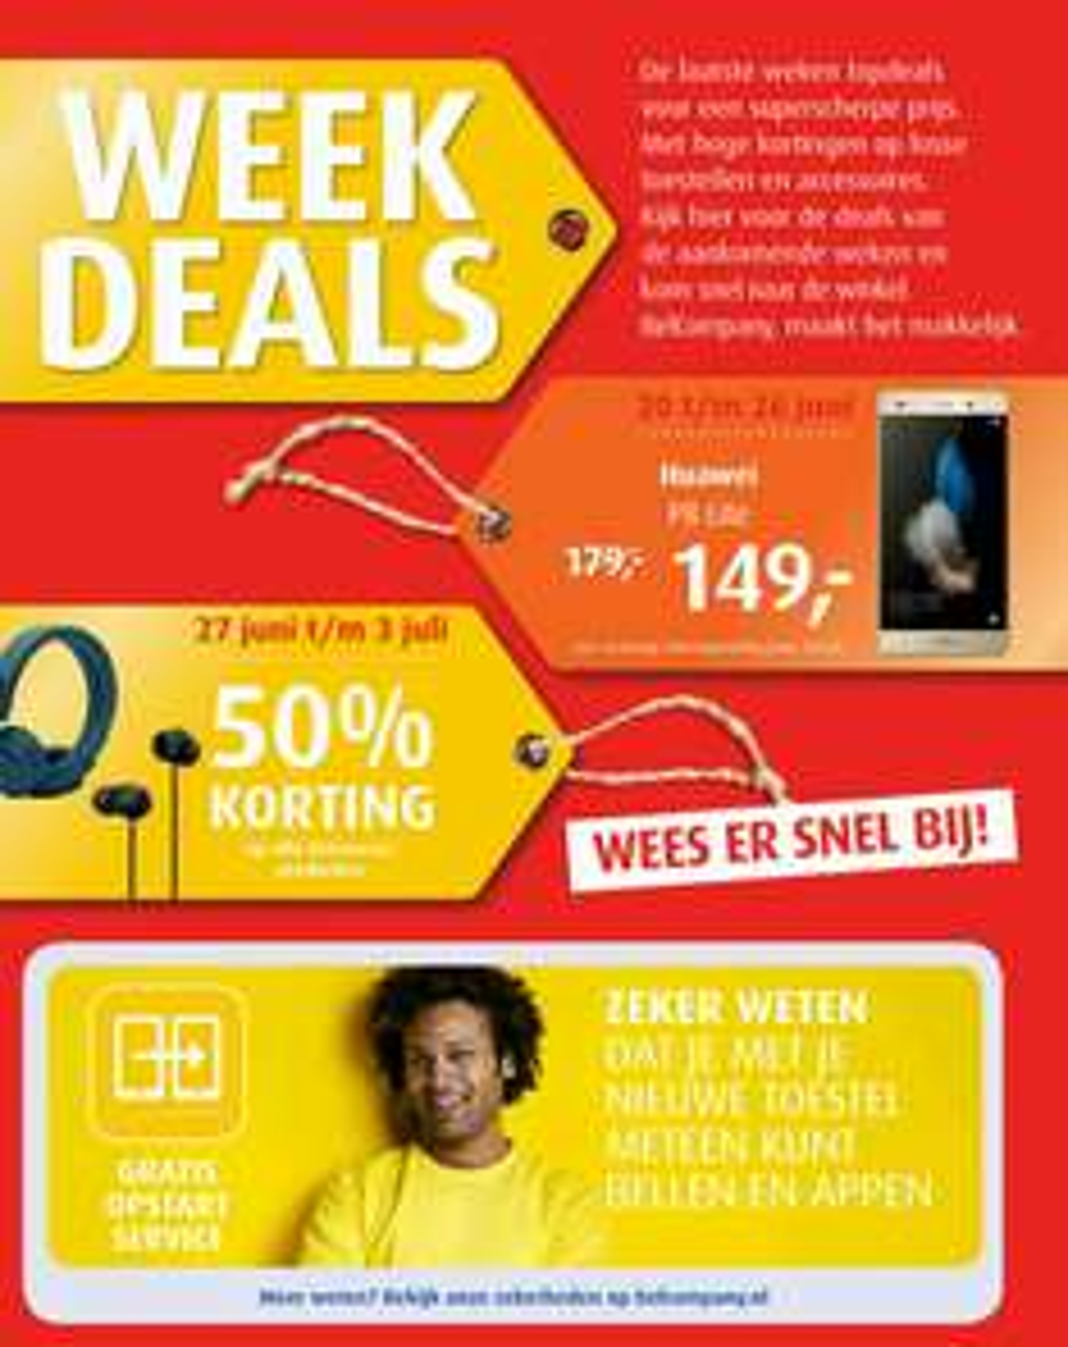 WeekDeals (Huawei P8 Lite - €149) @ Belcompany